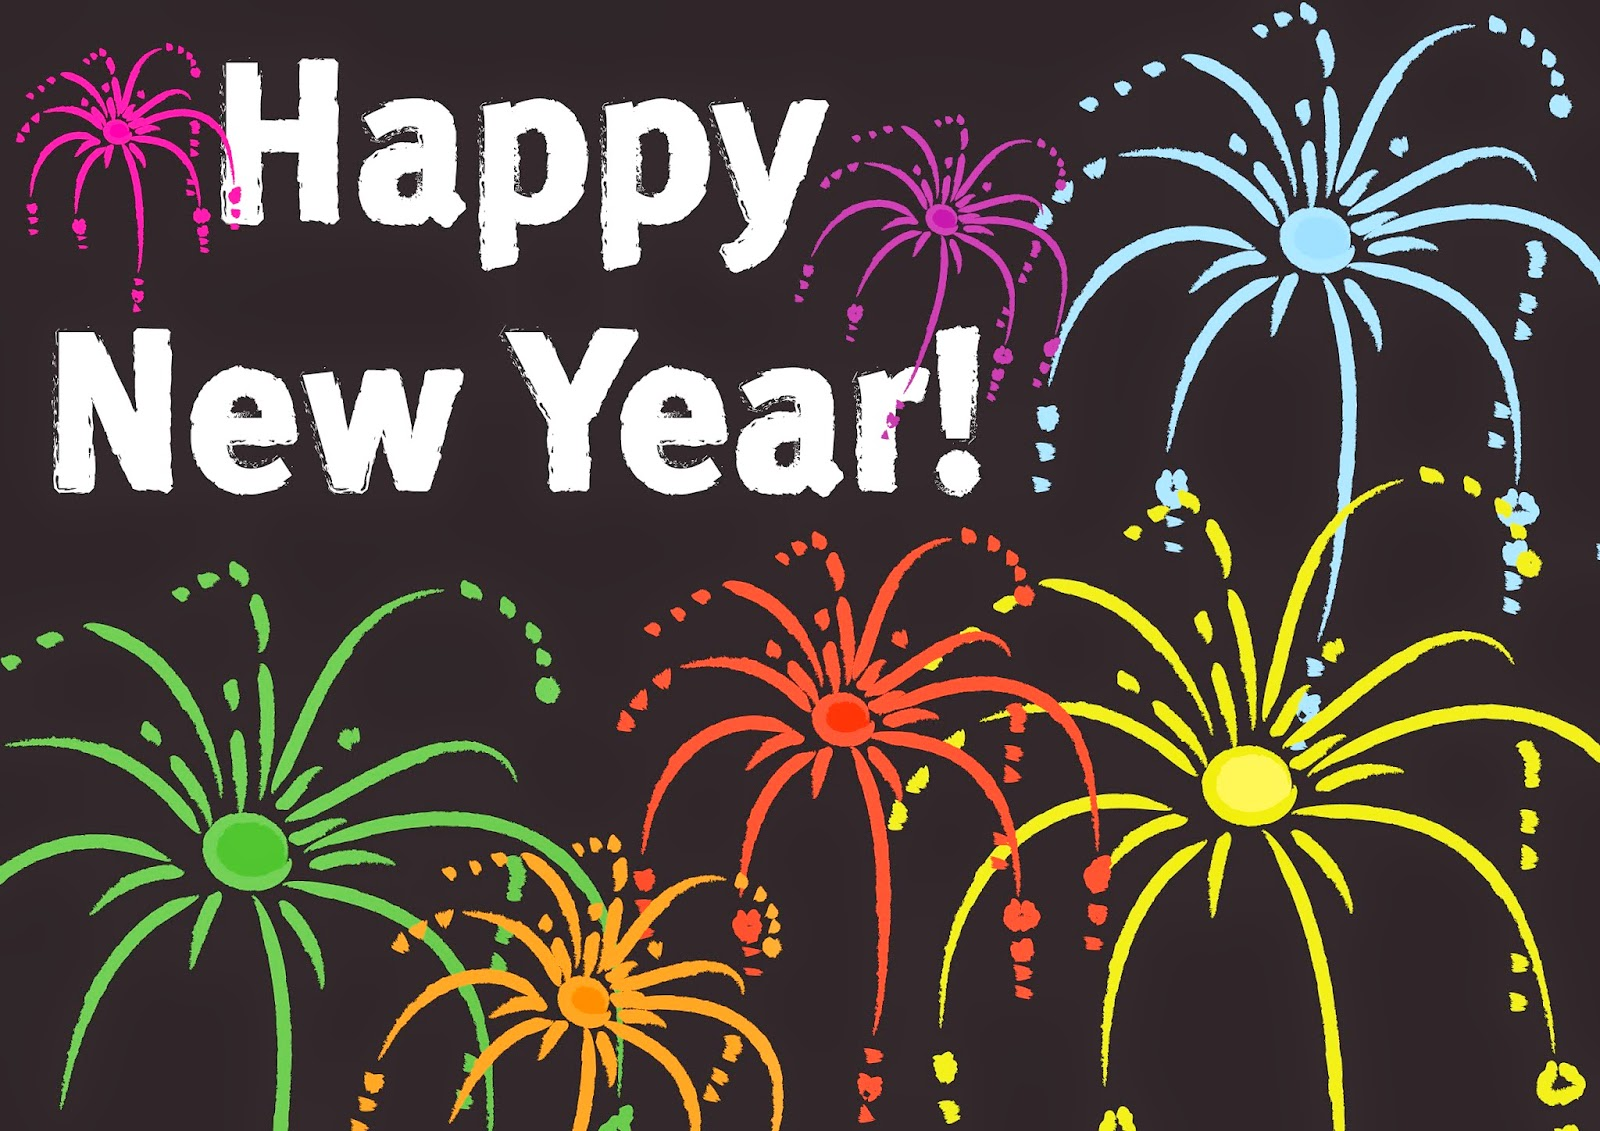 Happy New Year, part 3